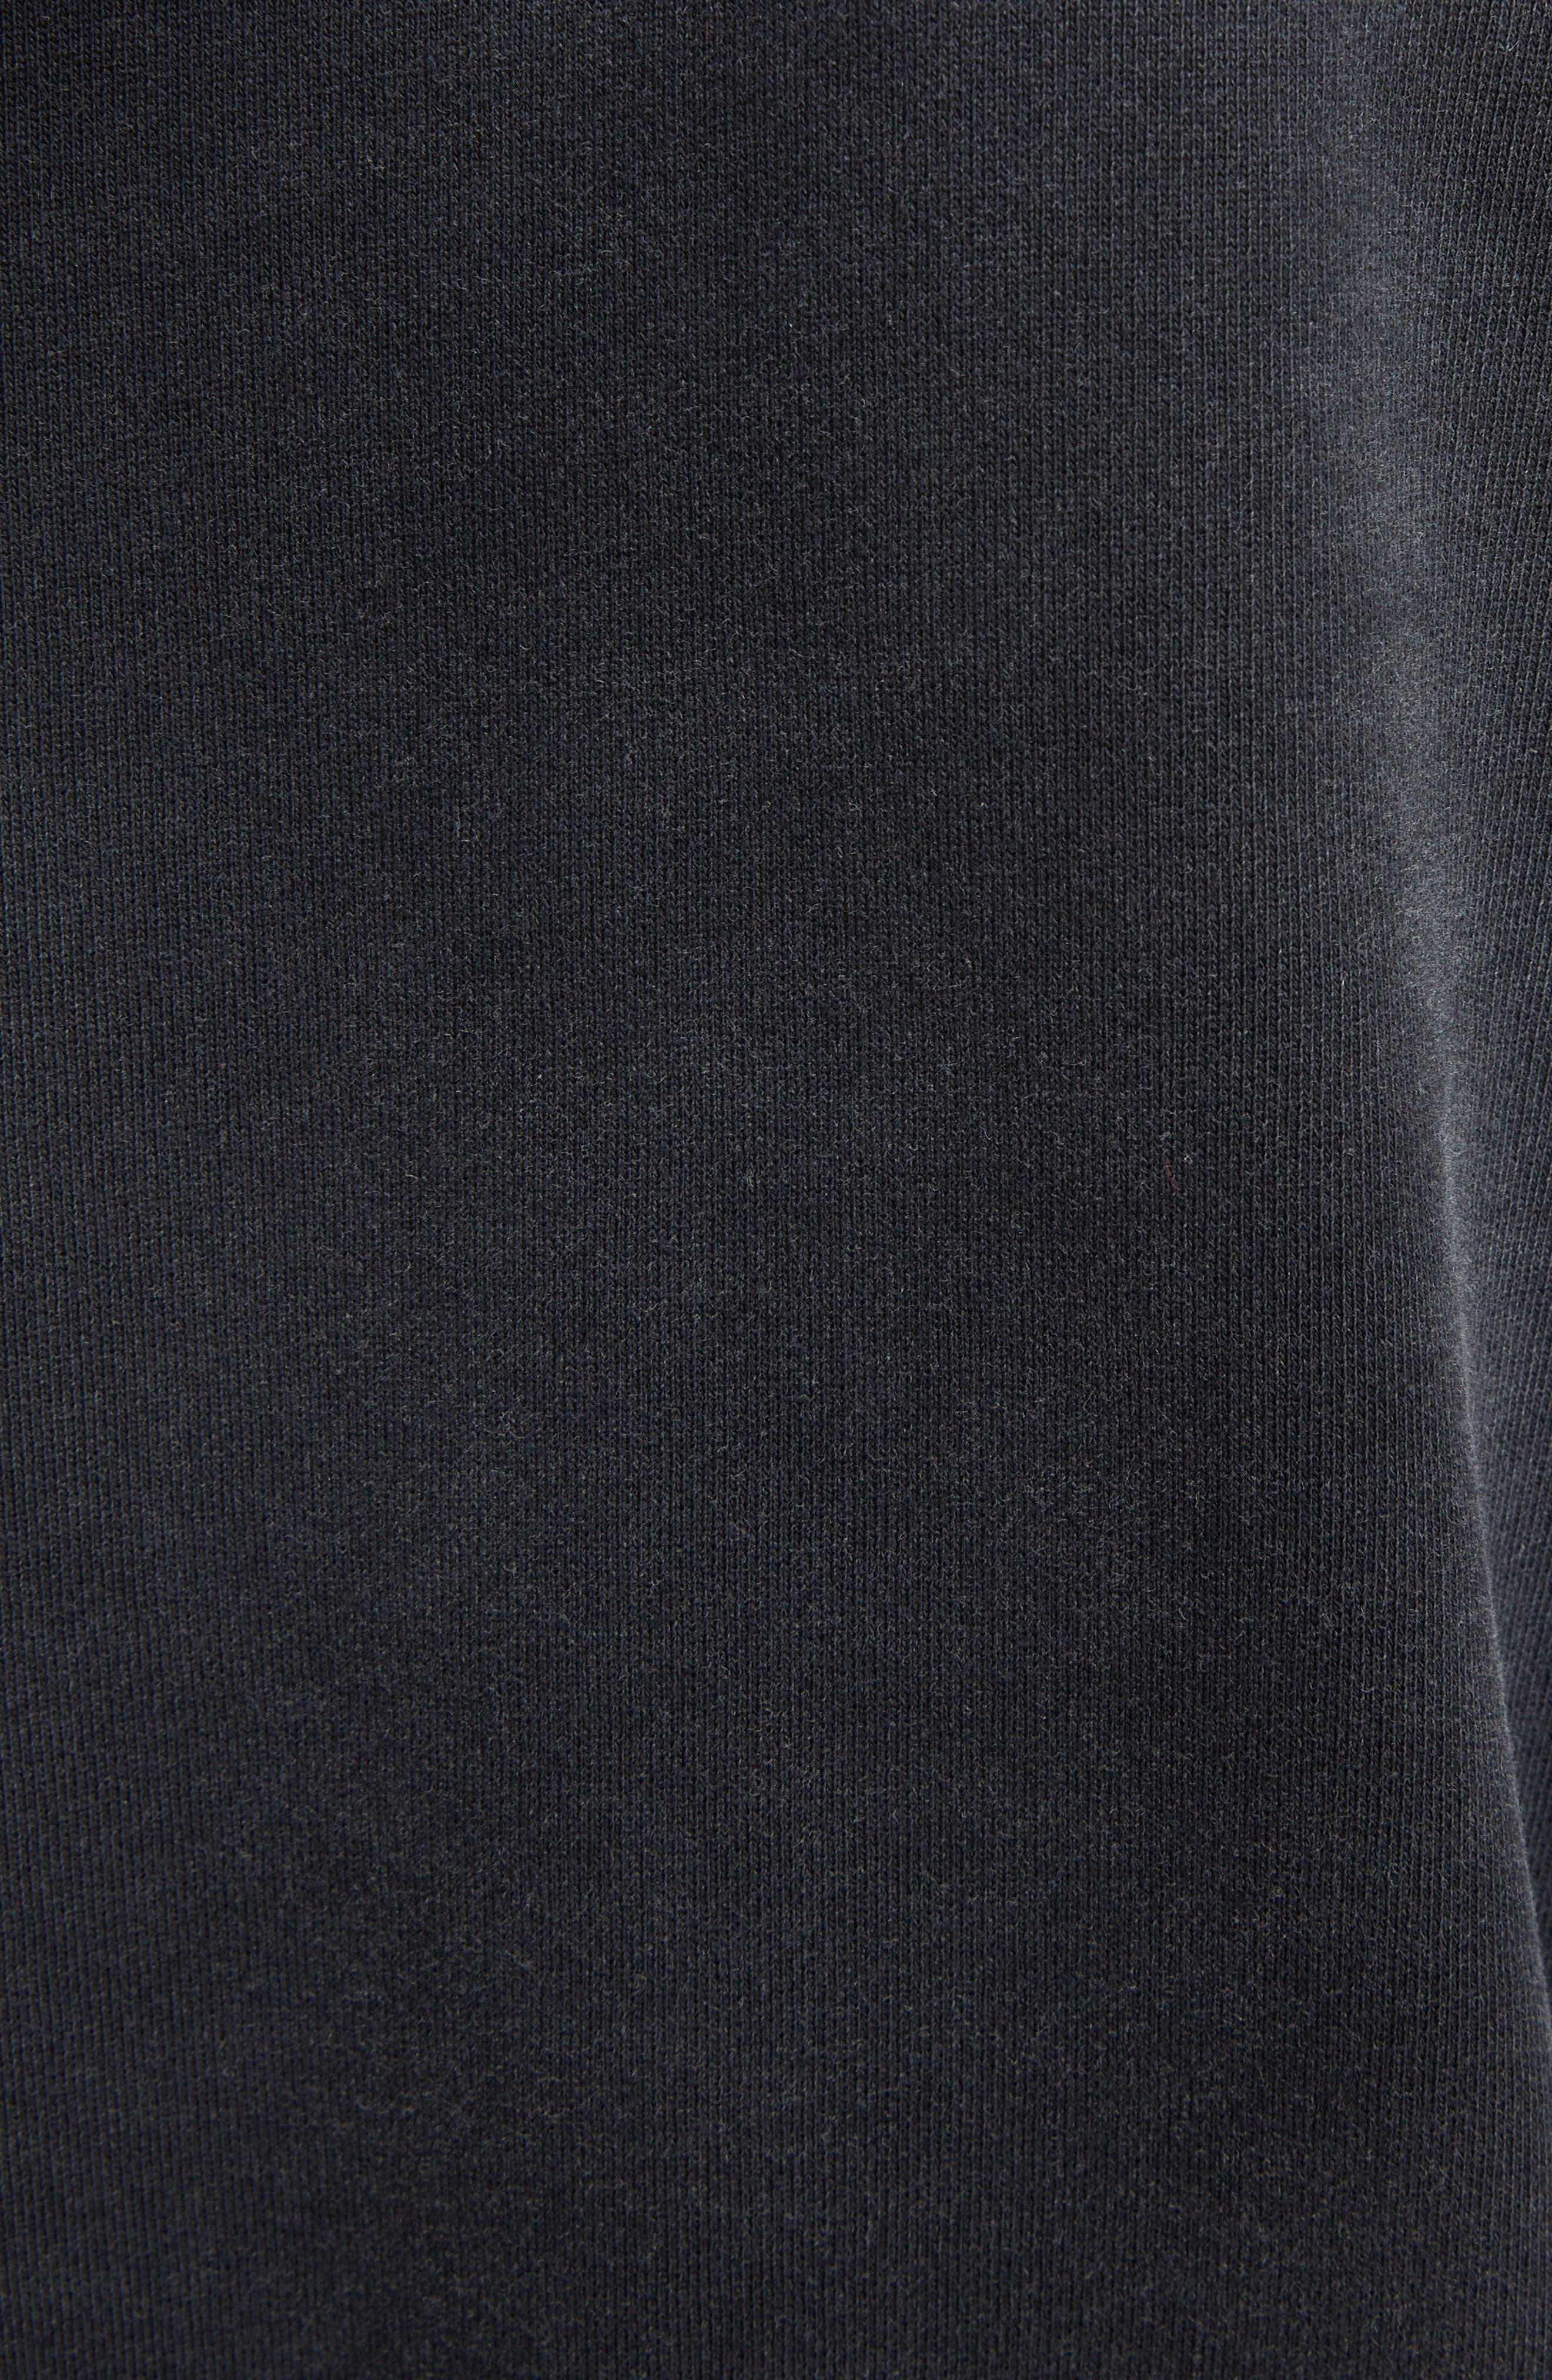 Destroyed Logo Hoodie,                             Alternate thumbnail 5, color,                             BLACK